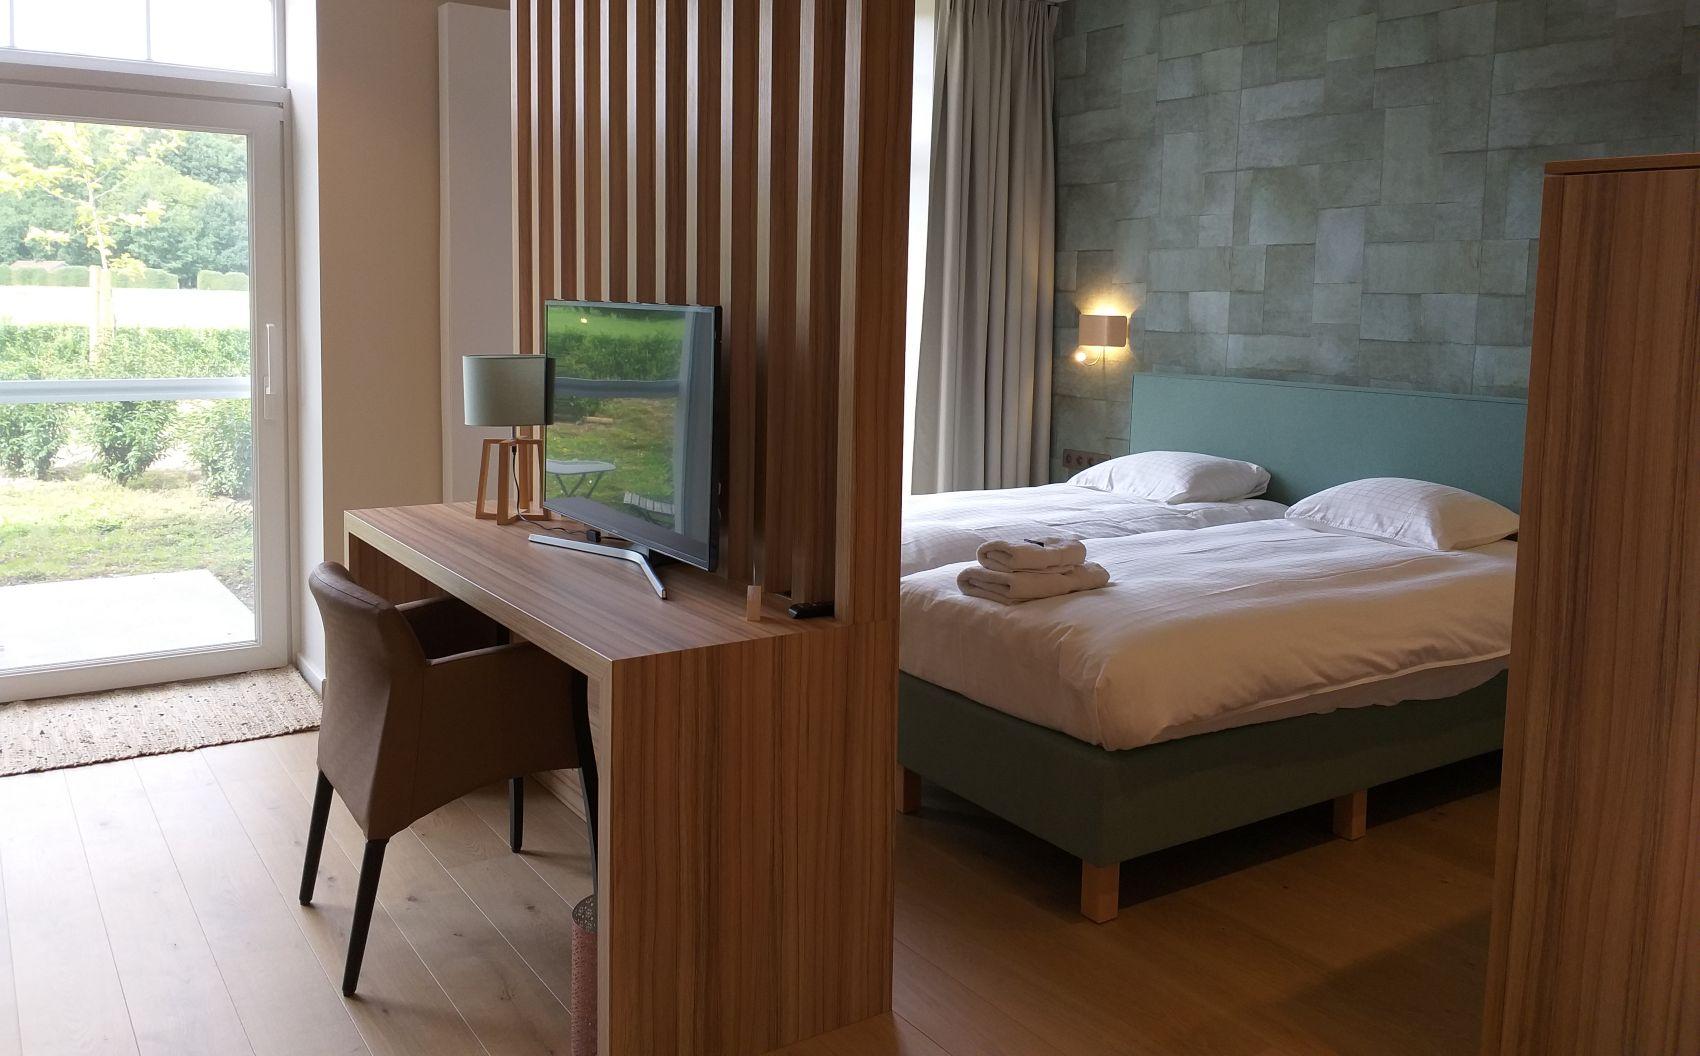 Hotel B bossuite met sauna